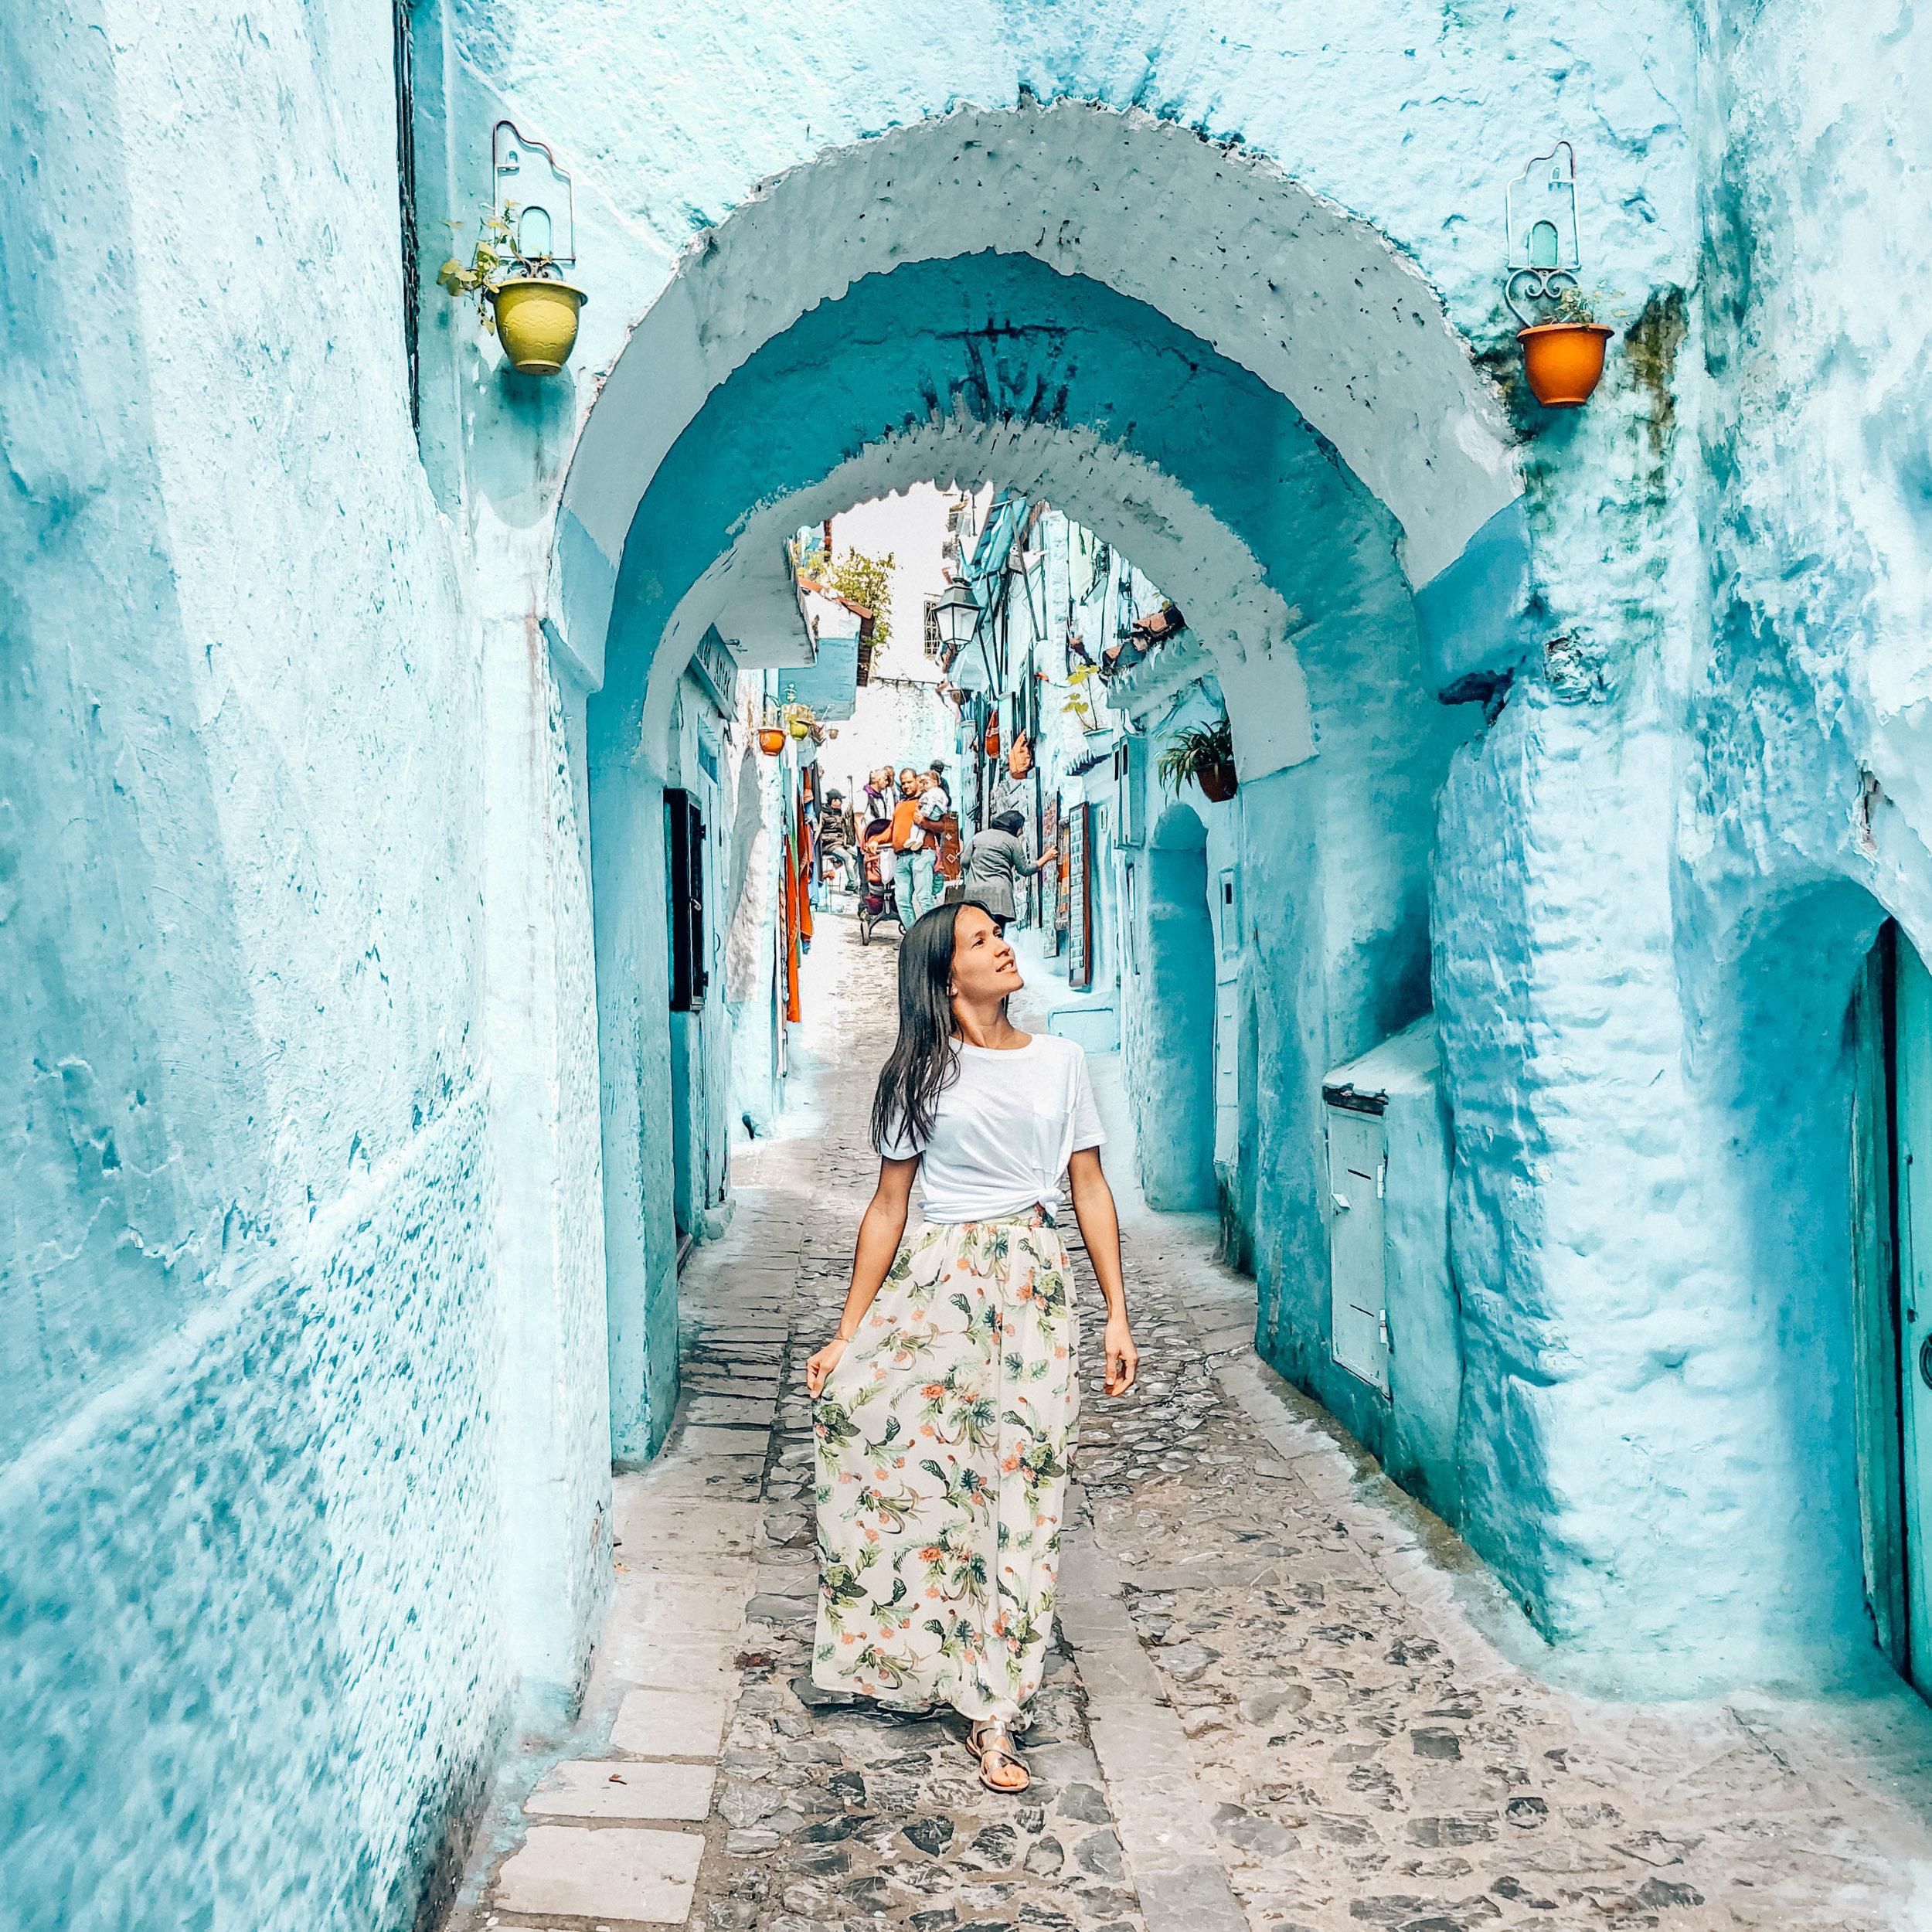 Marruecos2-WLC.jpg